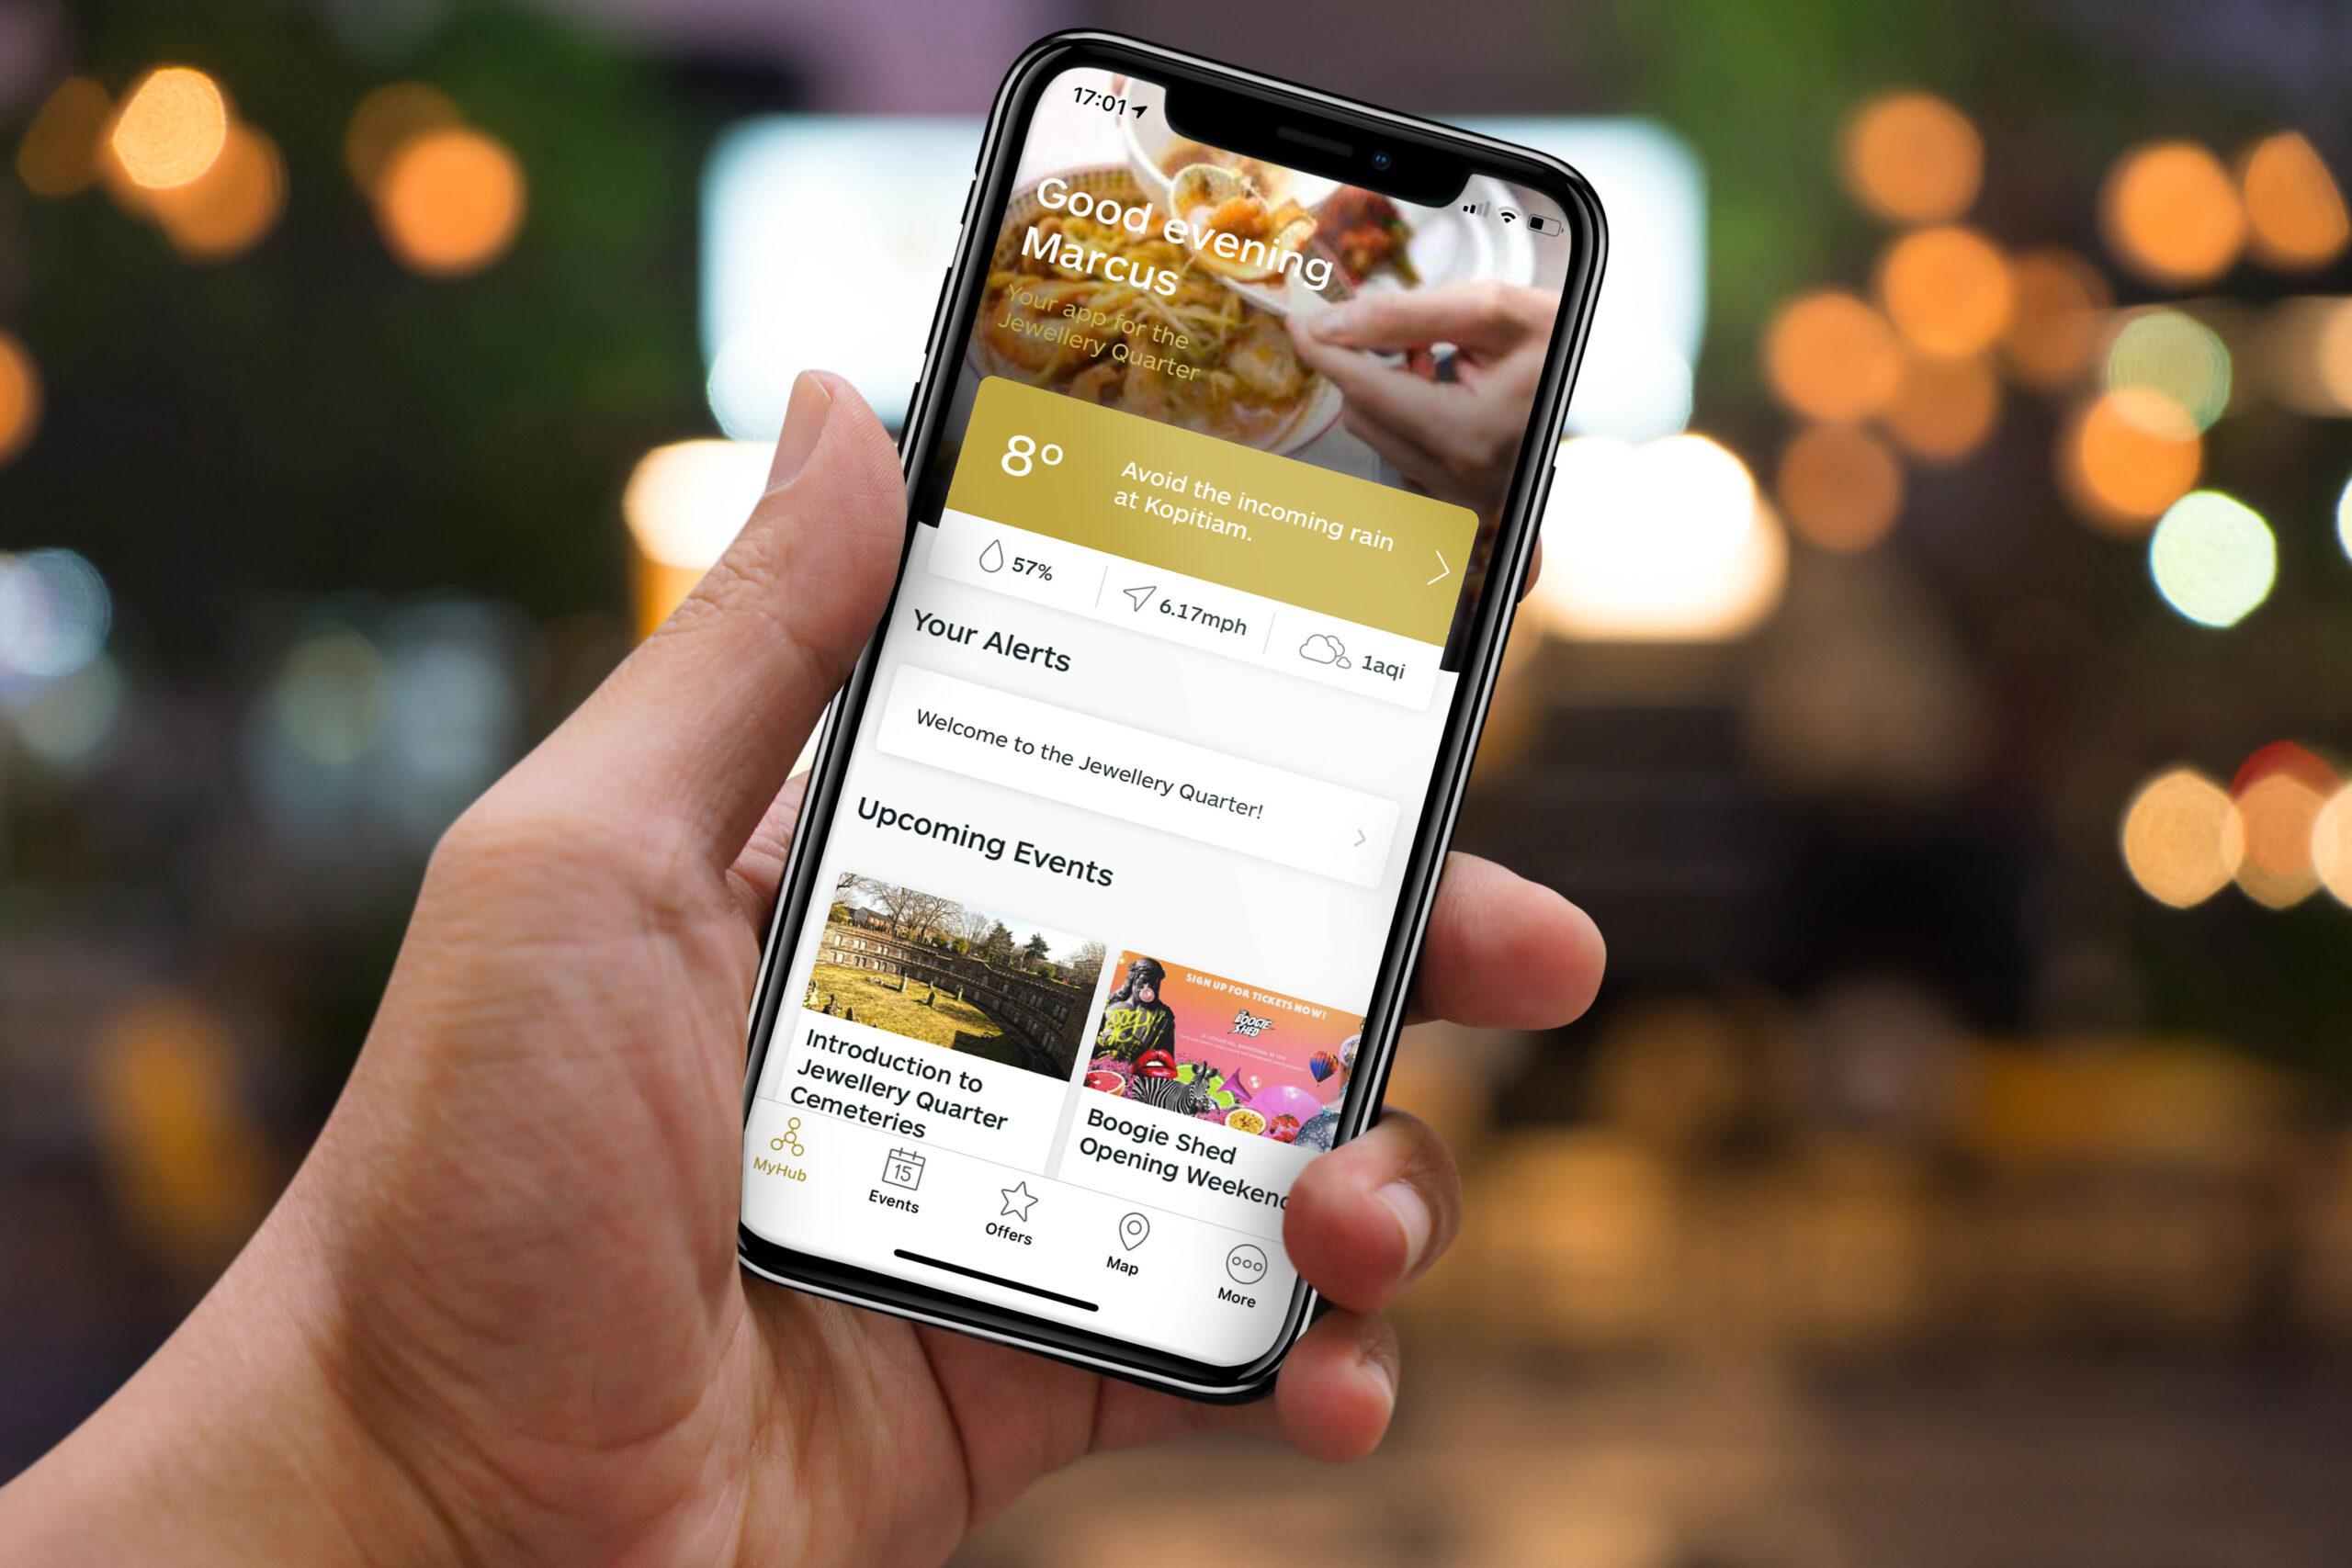 DiscoverJQ app developed by JQBID